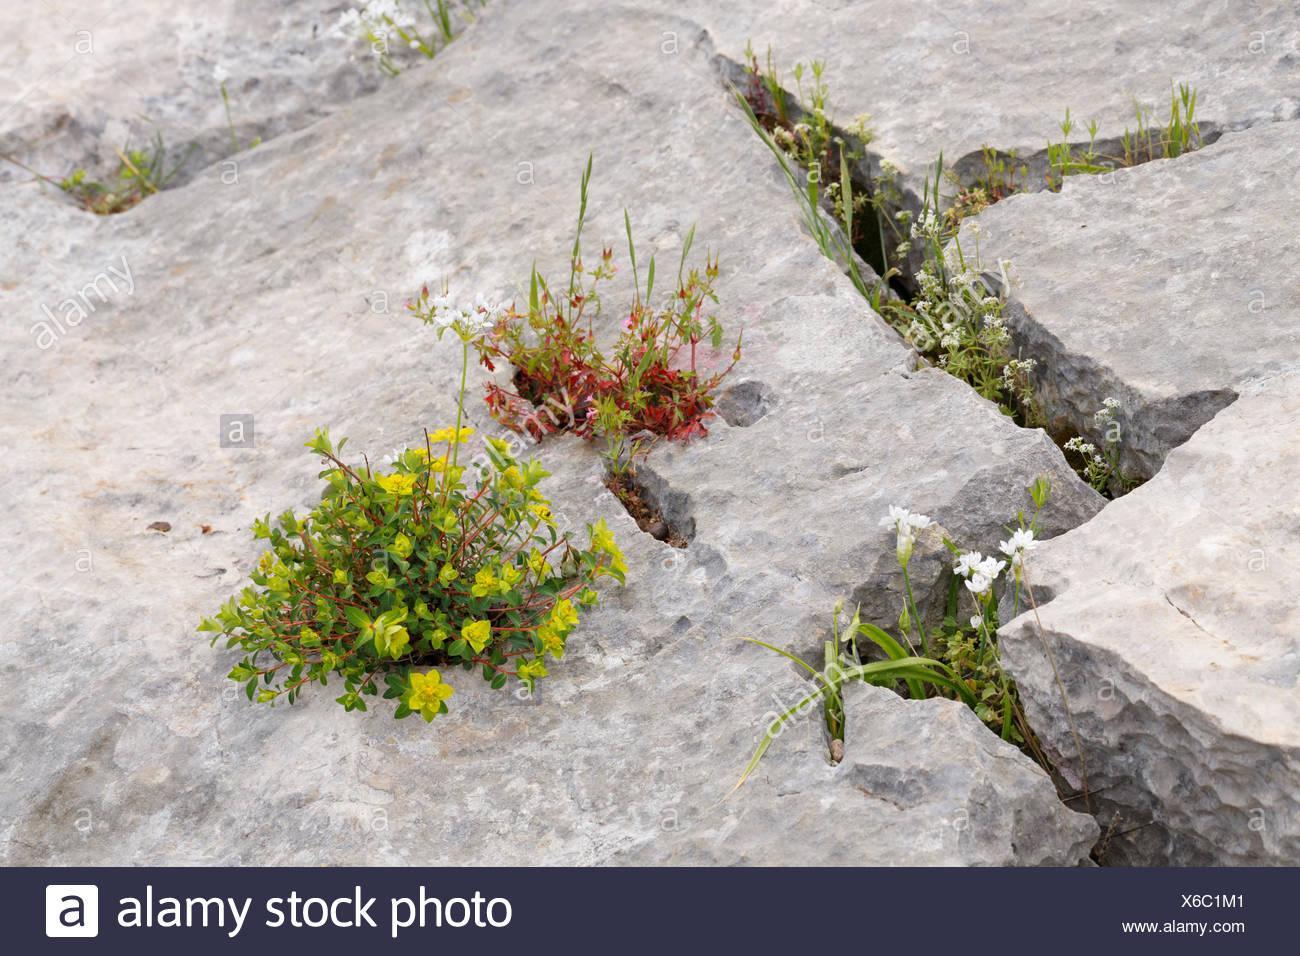 Flowers growing in crevices, Ölüdeniz, Muğla Province, Aegean region, Turkey Stock Photo